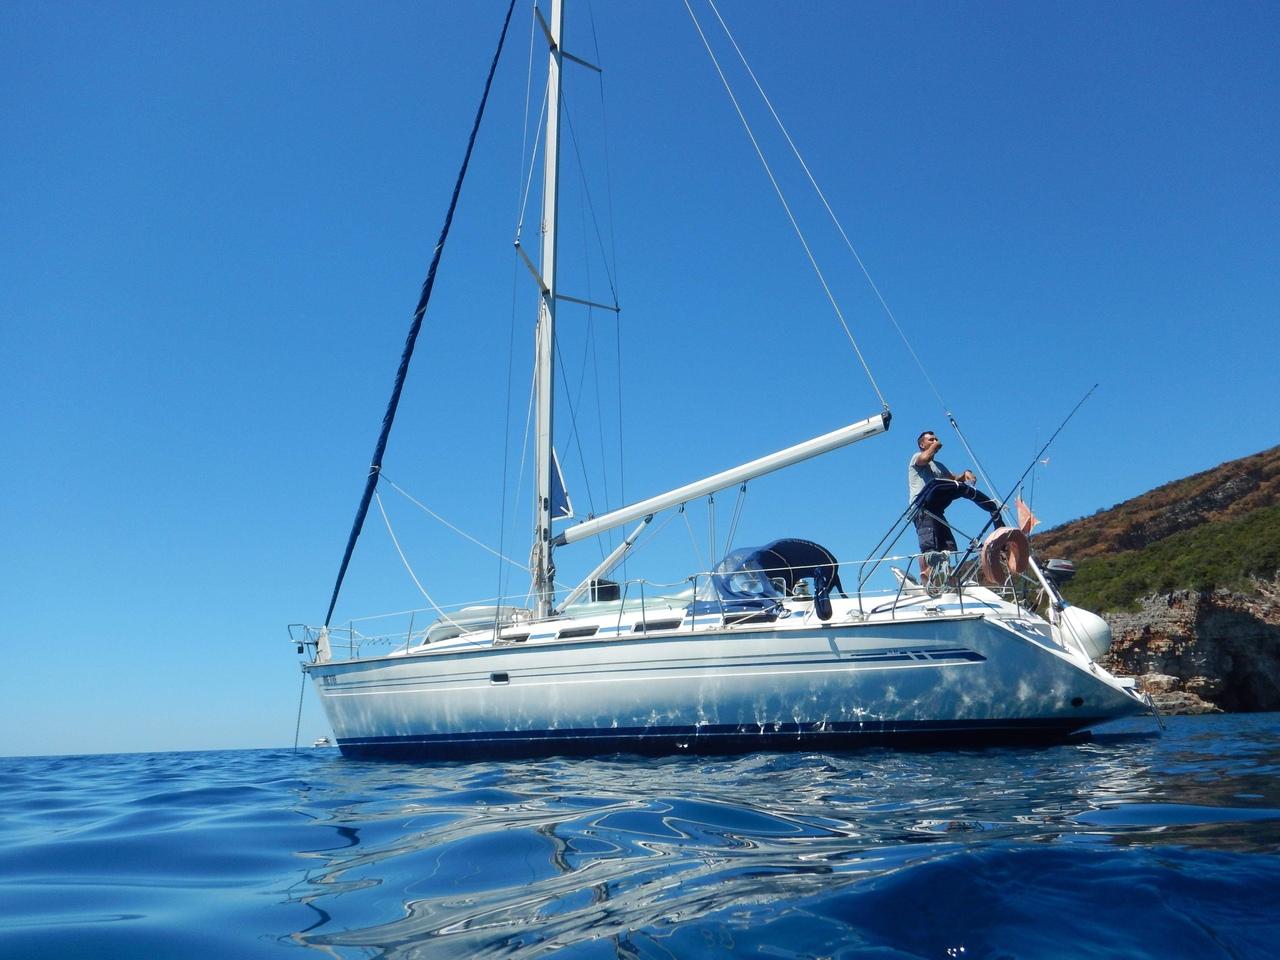 Афиша Самара Черногория - путешествие на яхте! Сентябрь 2019